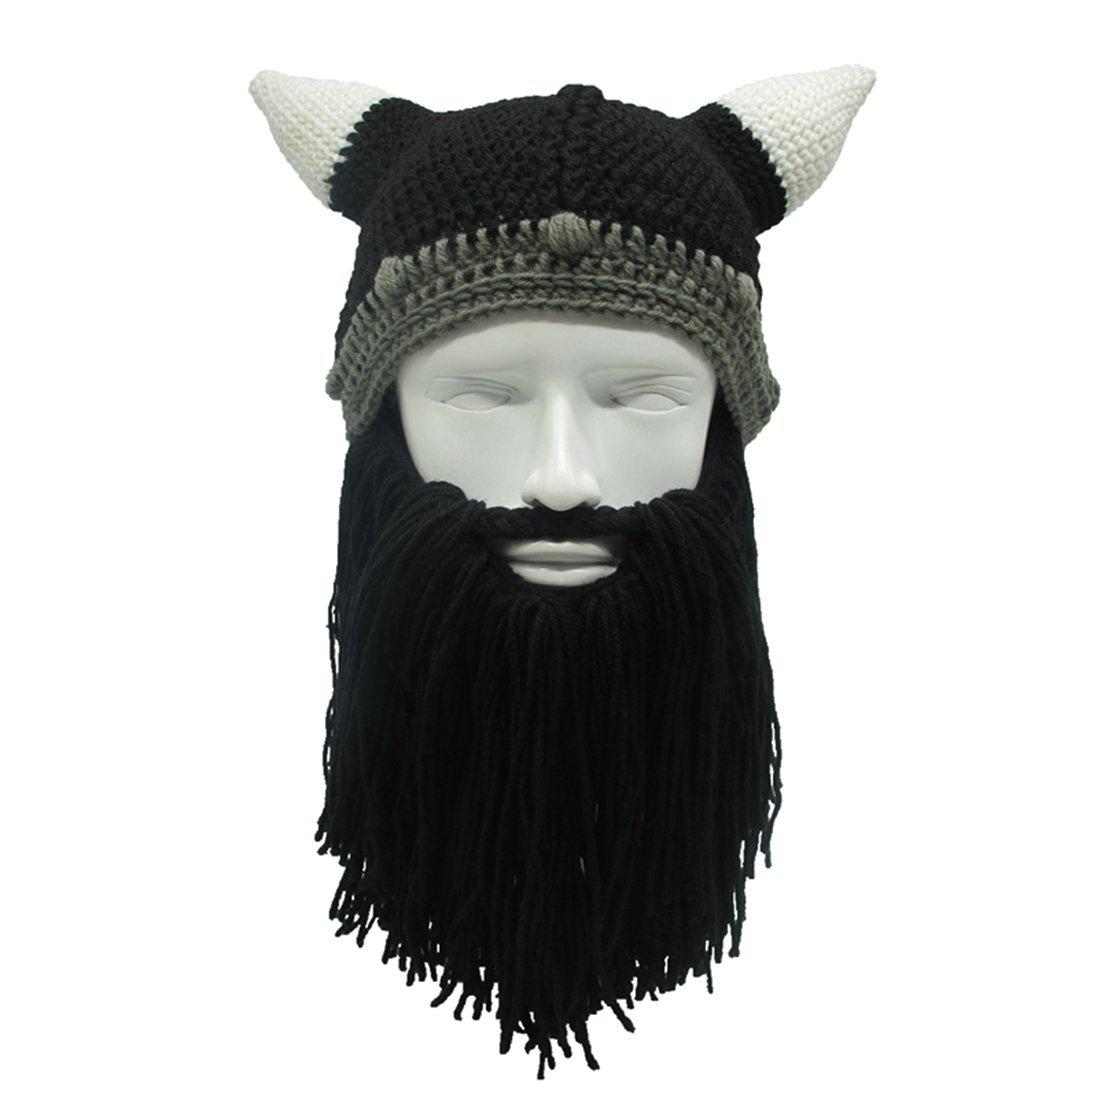 22c431db4e9 Get Quotations · ZGZY Beard Hat Beanie Knit Pirate Original Barbarian  Warrior Knit Beard Hat Halloween Viking Horns Bearded